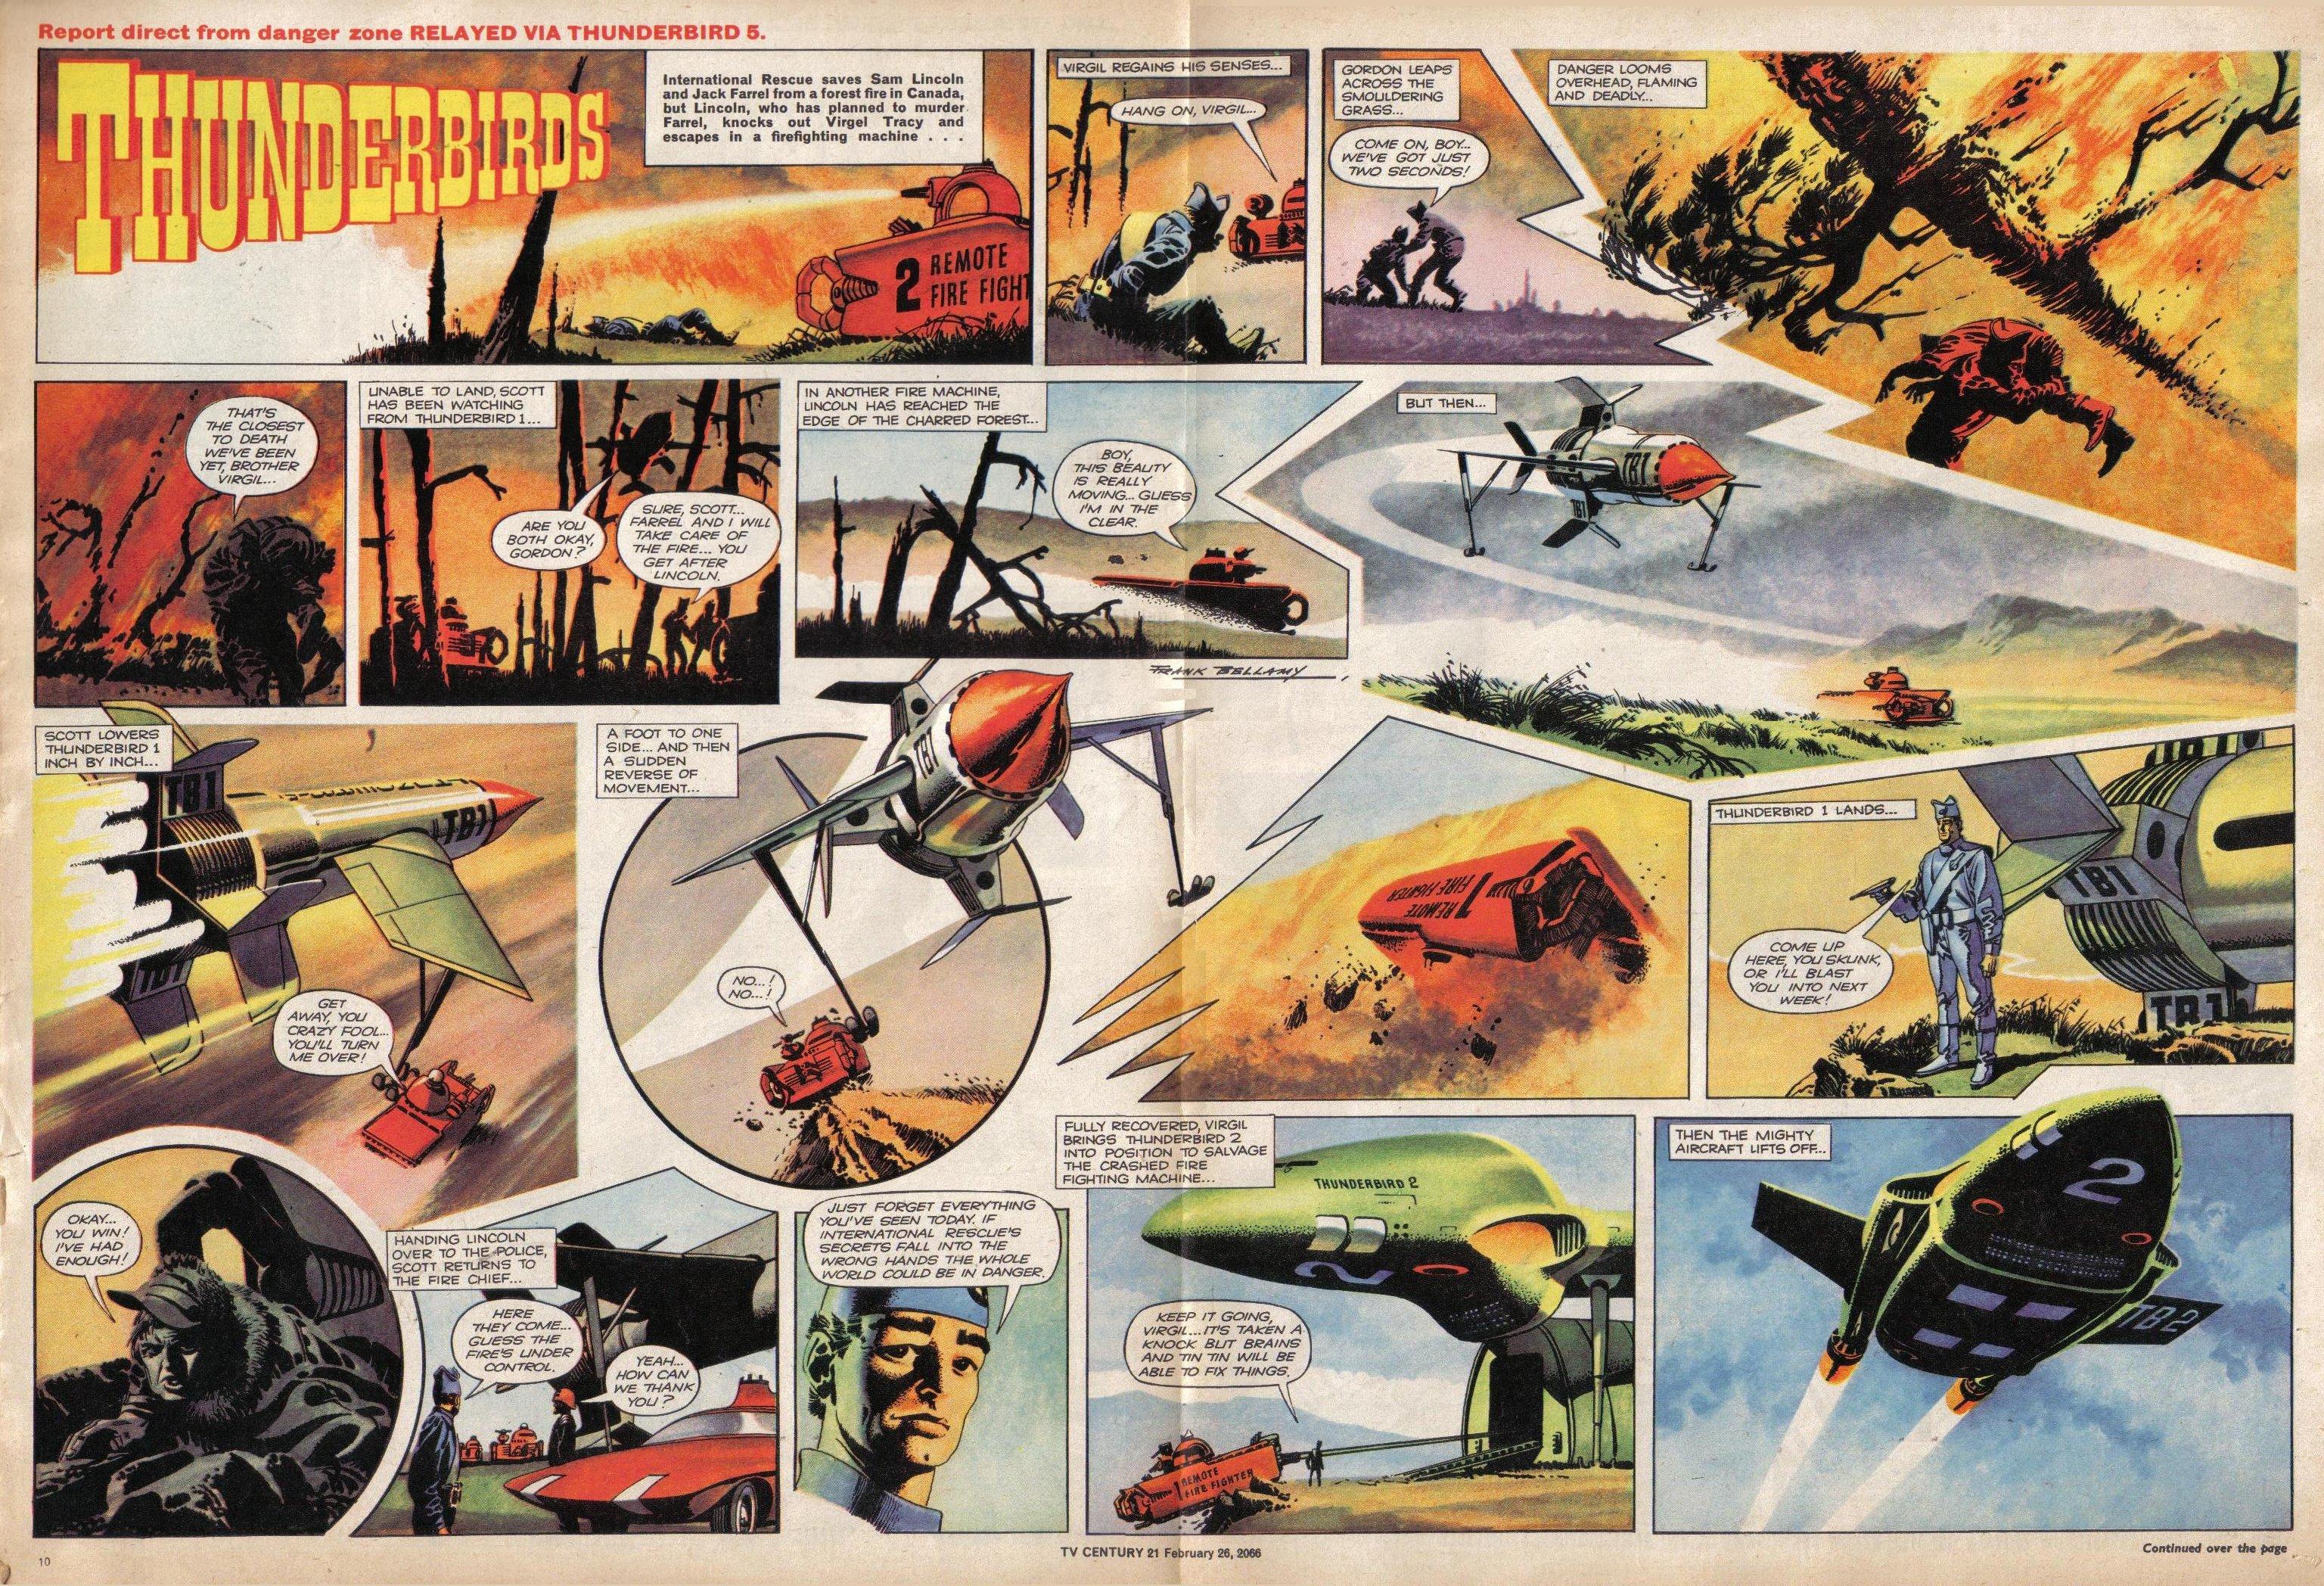 Read online TV Century 21 (TV 21) comic -  Issue #58 - 10